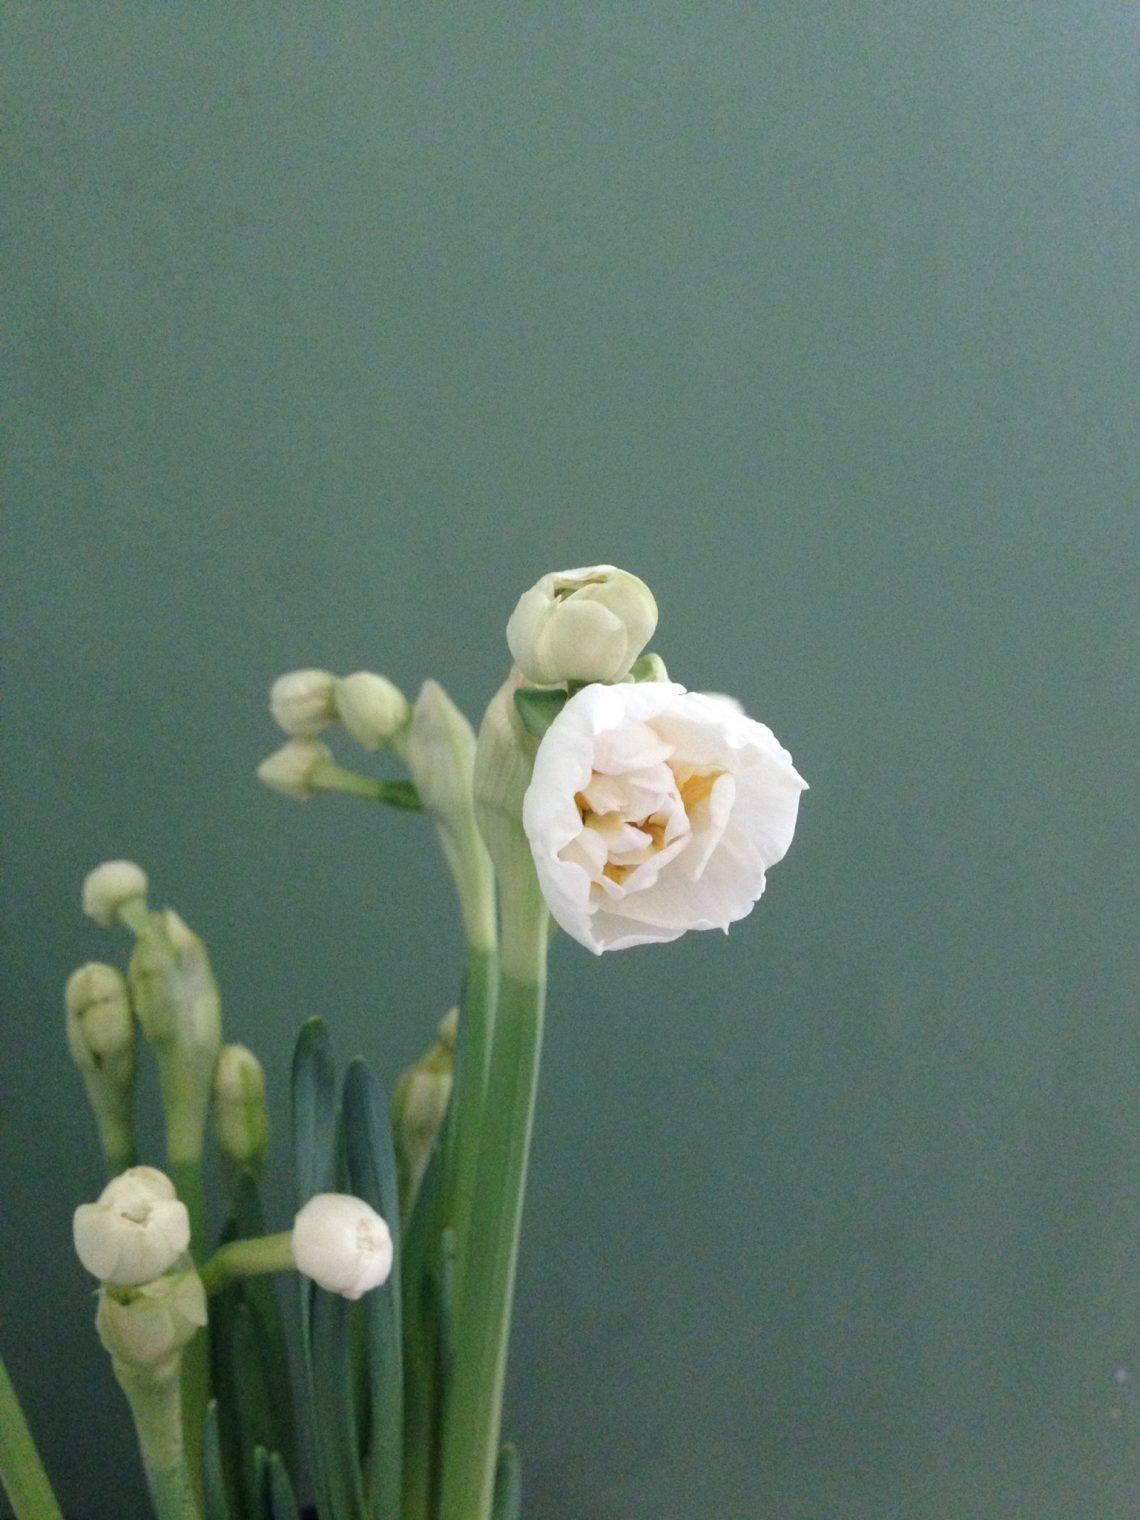 Spring flowers – showcasing beautiful Britain